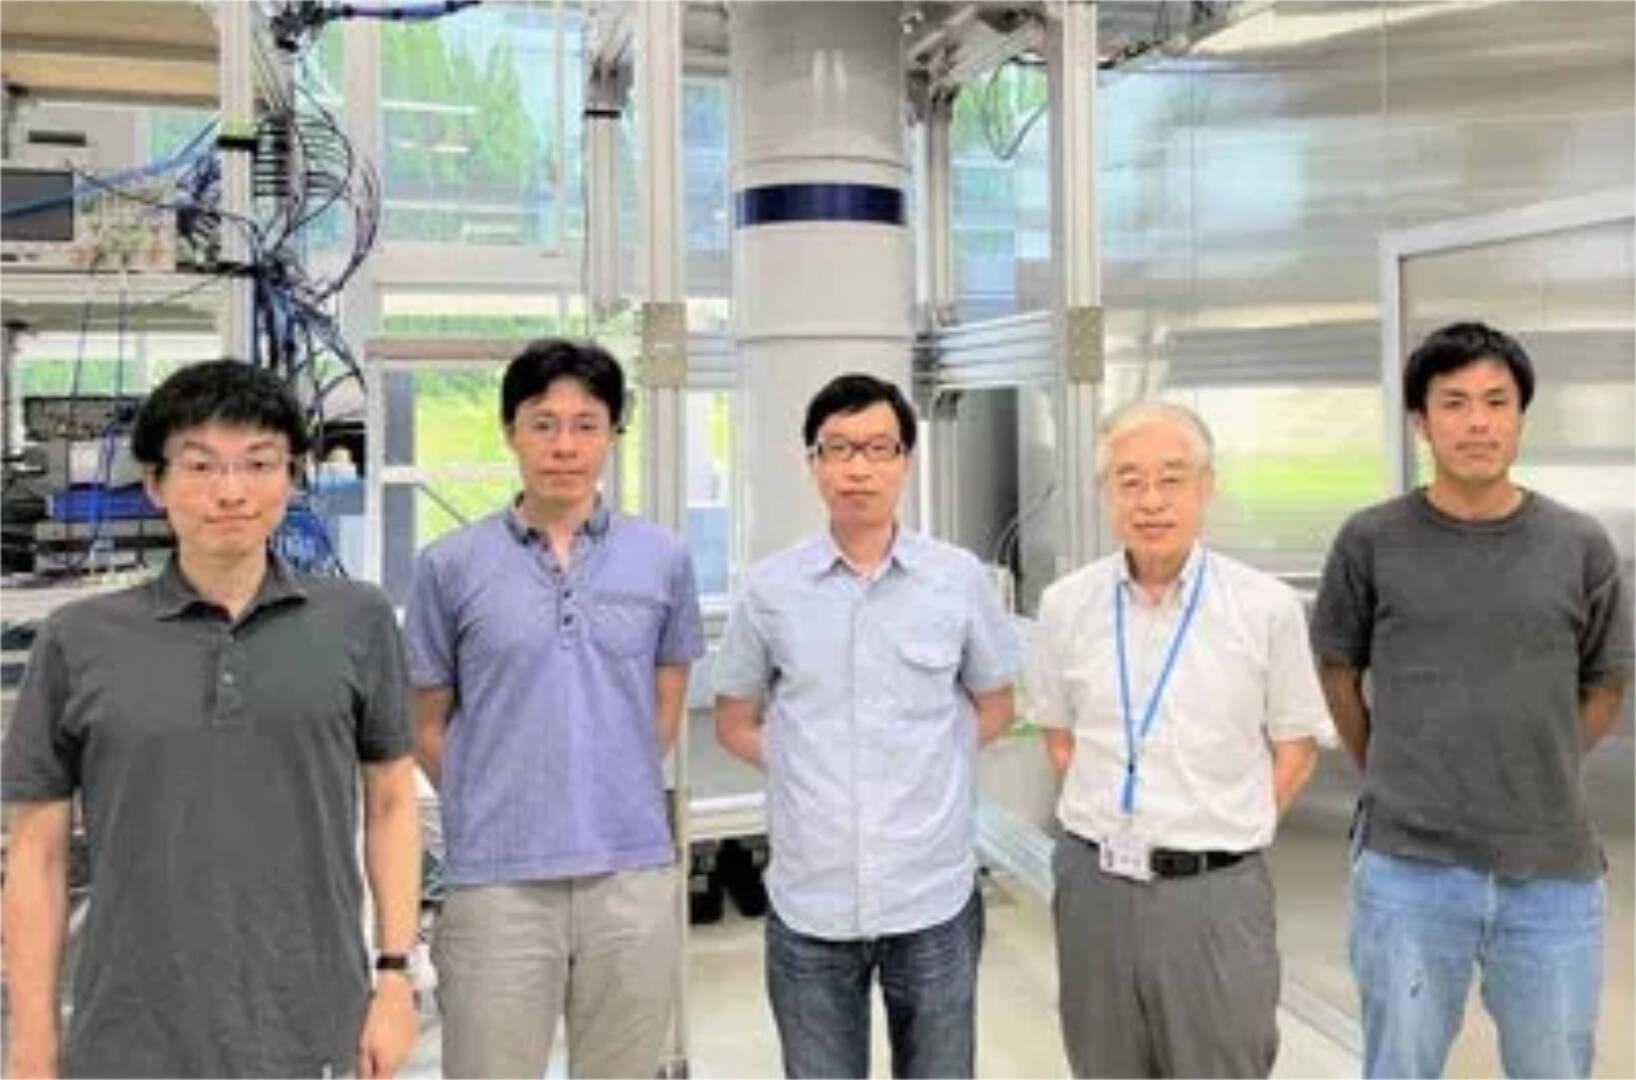 Riken Center for Emergent Matter Science